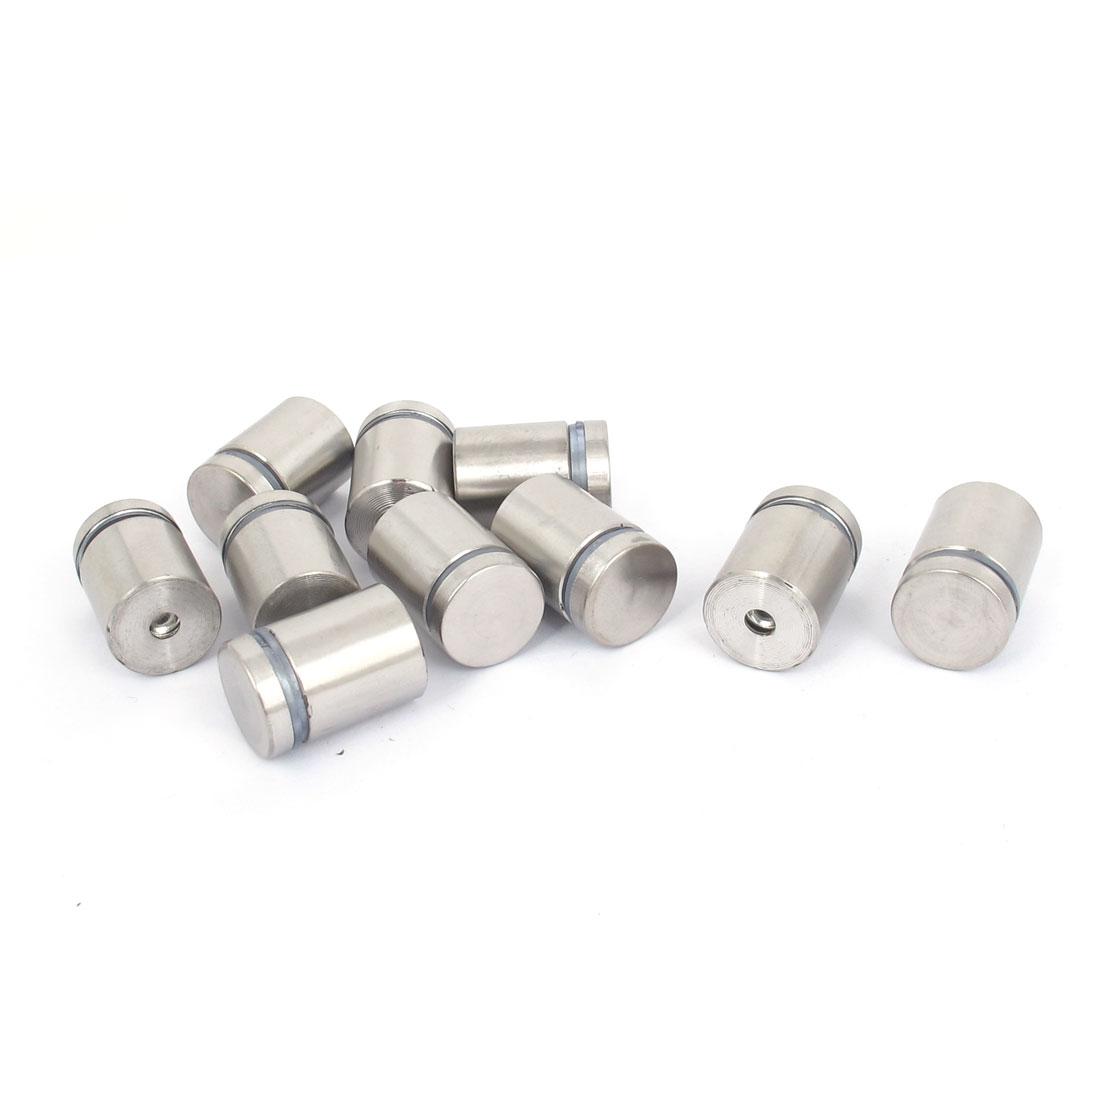 19mm x 25mm Stainless Steel Advertising Frameless Glass Standoff Pins 10pcs